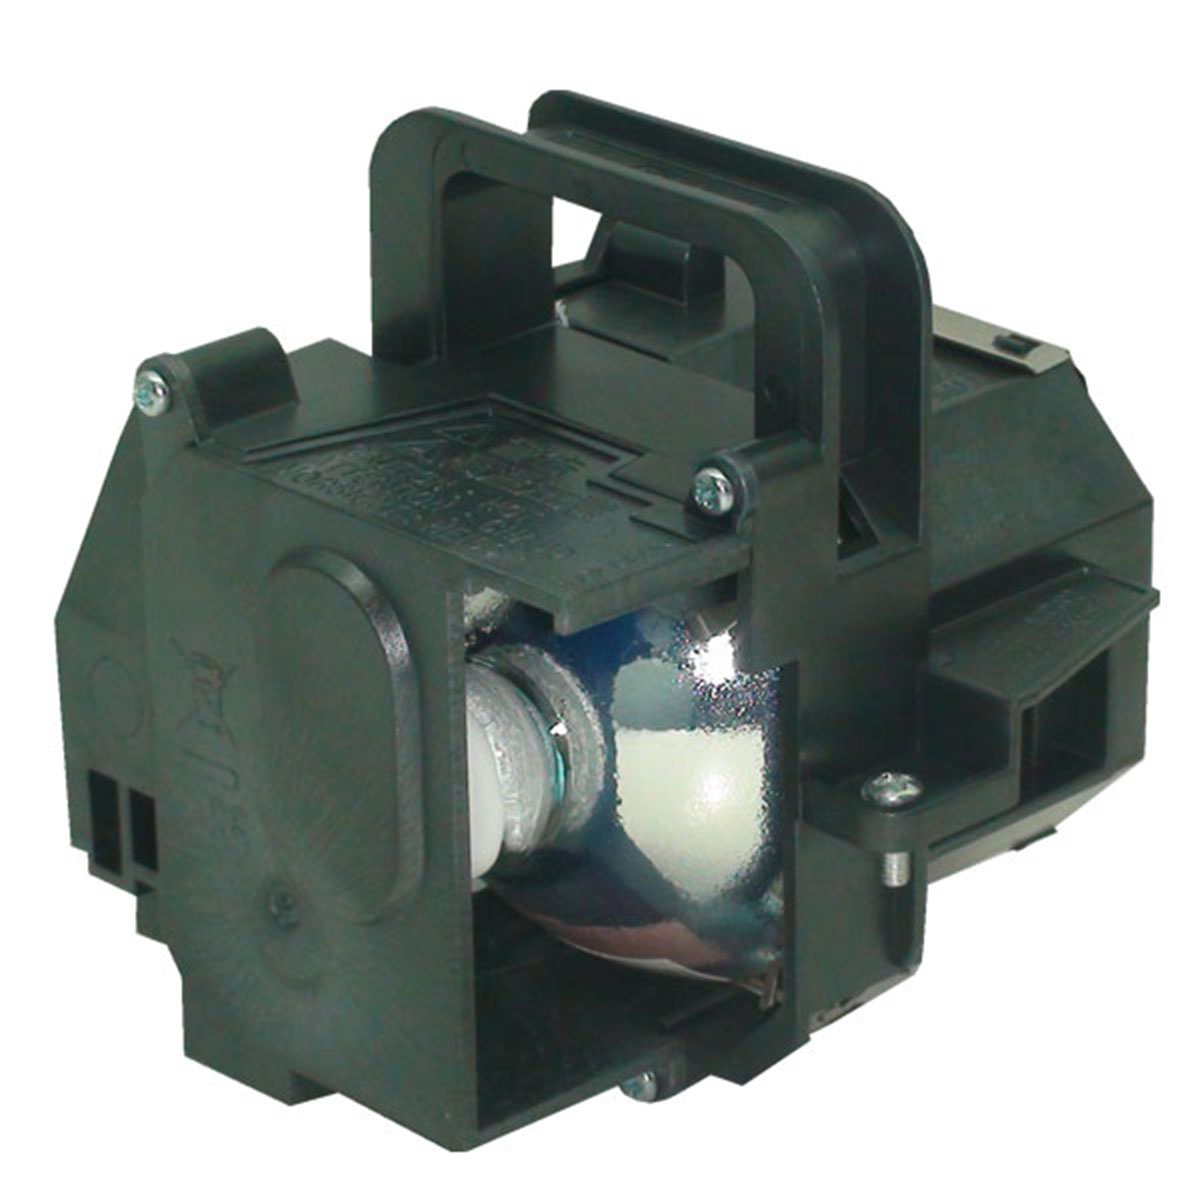 Lutema Platinum Bulb for Epson PowerLite Home Cinema 8700 UB Projector (Lamp Only) - image 3 de 5